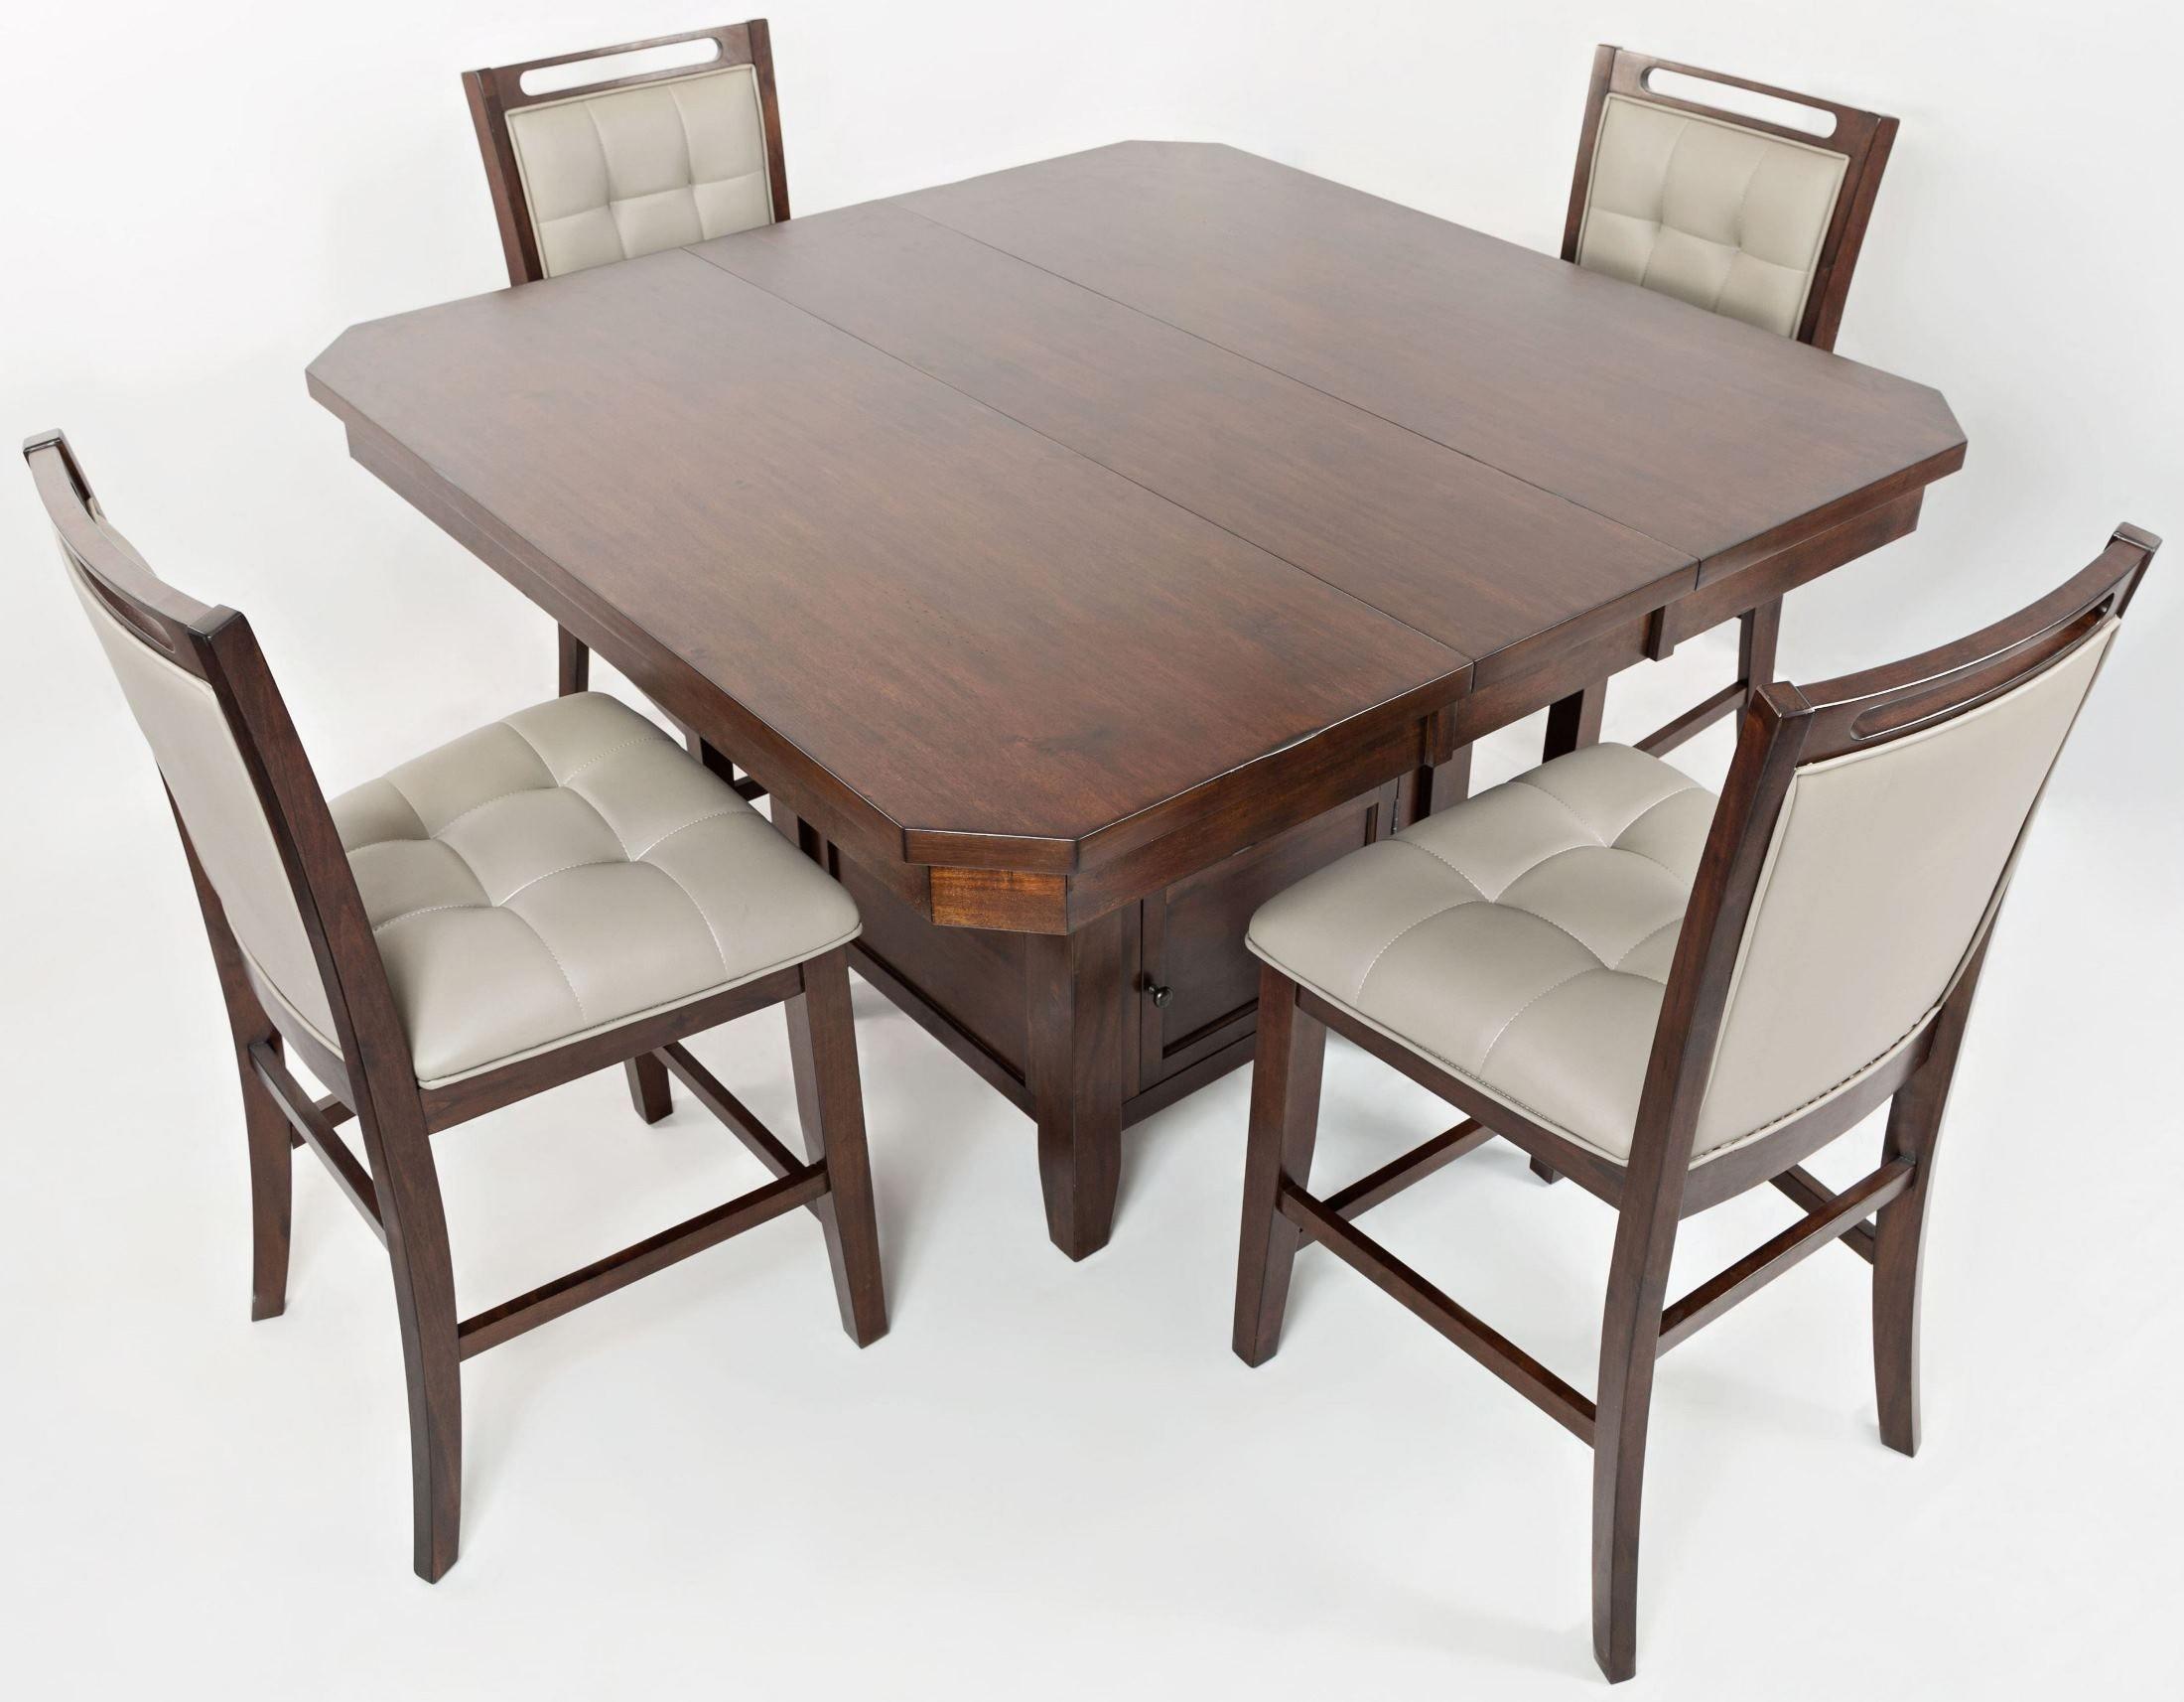 manchester storage adjustable dining table manchester storage adjustable dining table from jofran   coleman      rh   colemanfurniture com